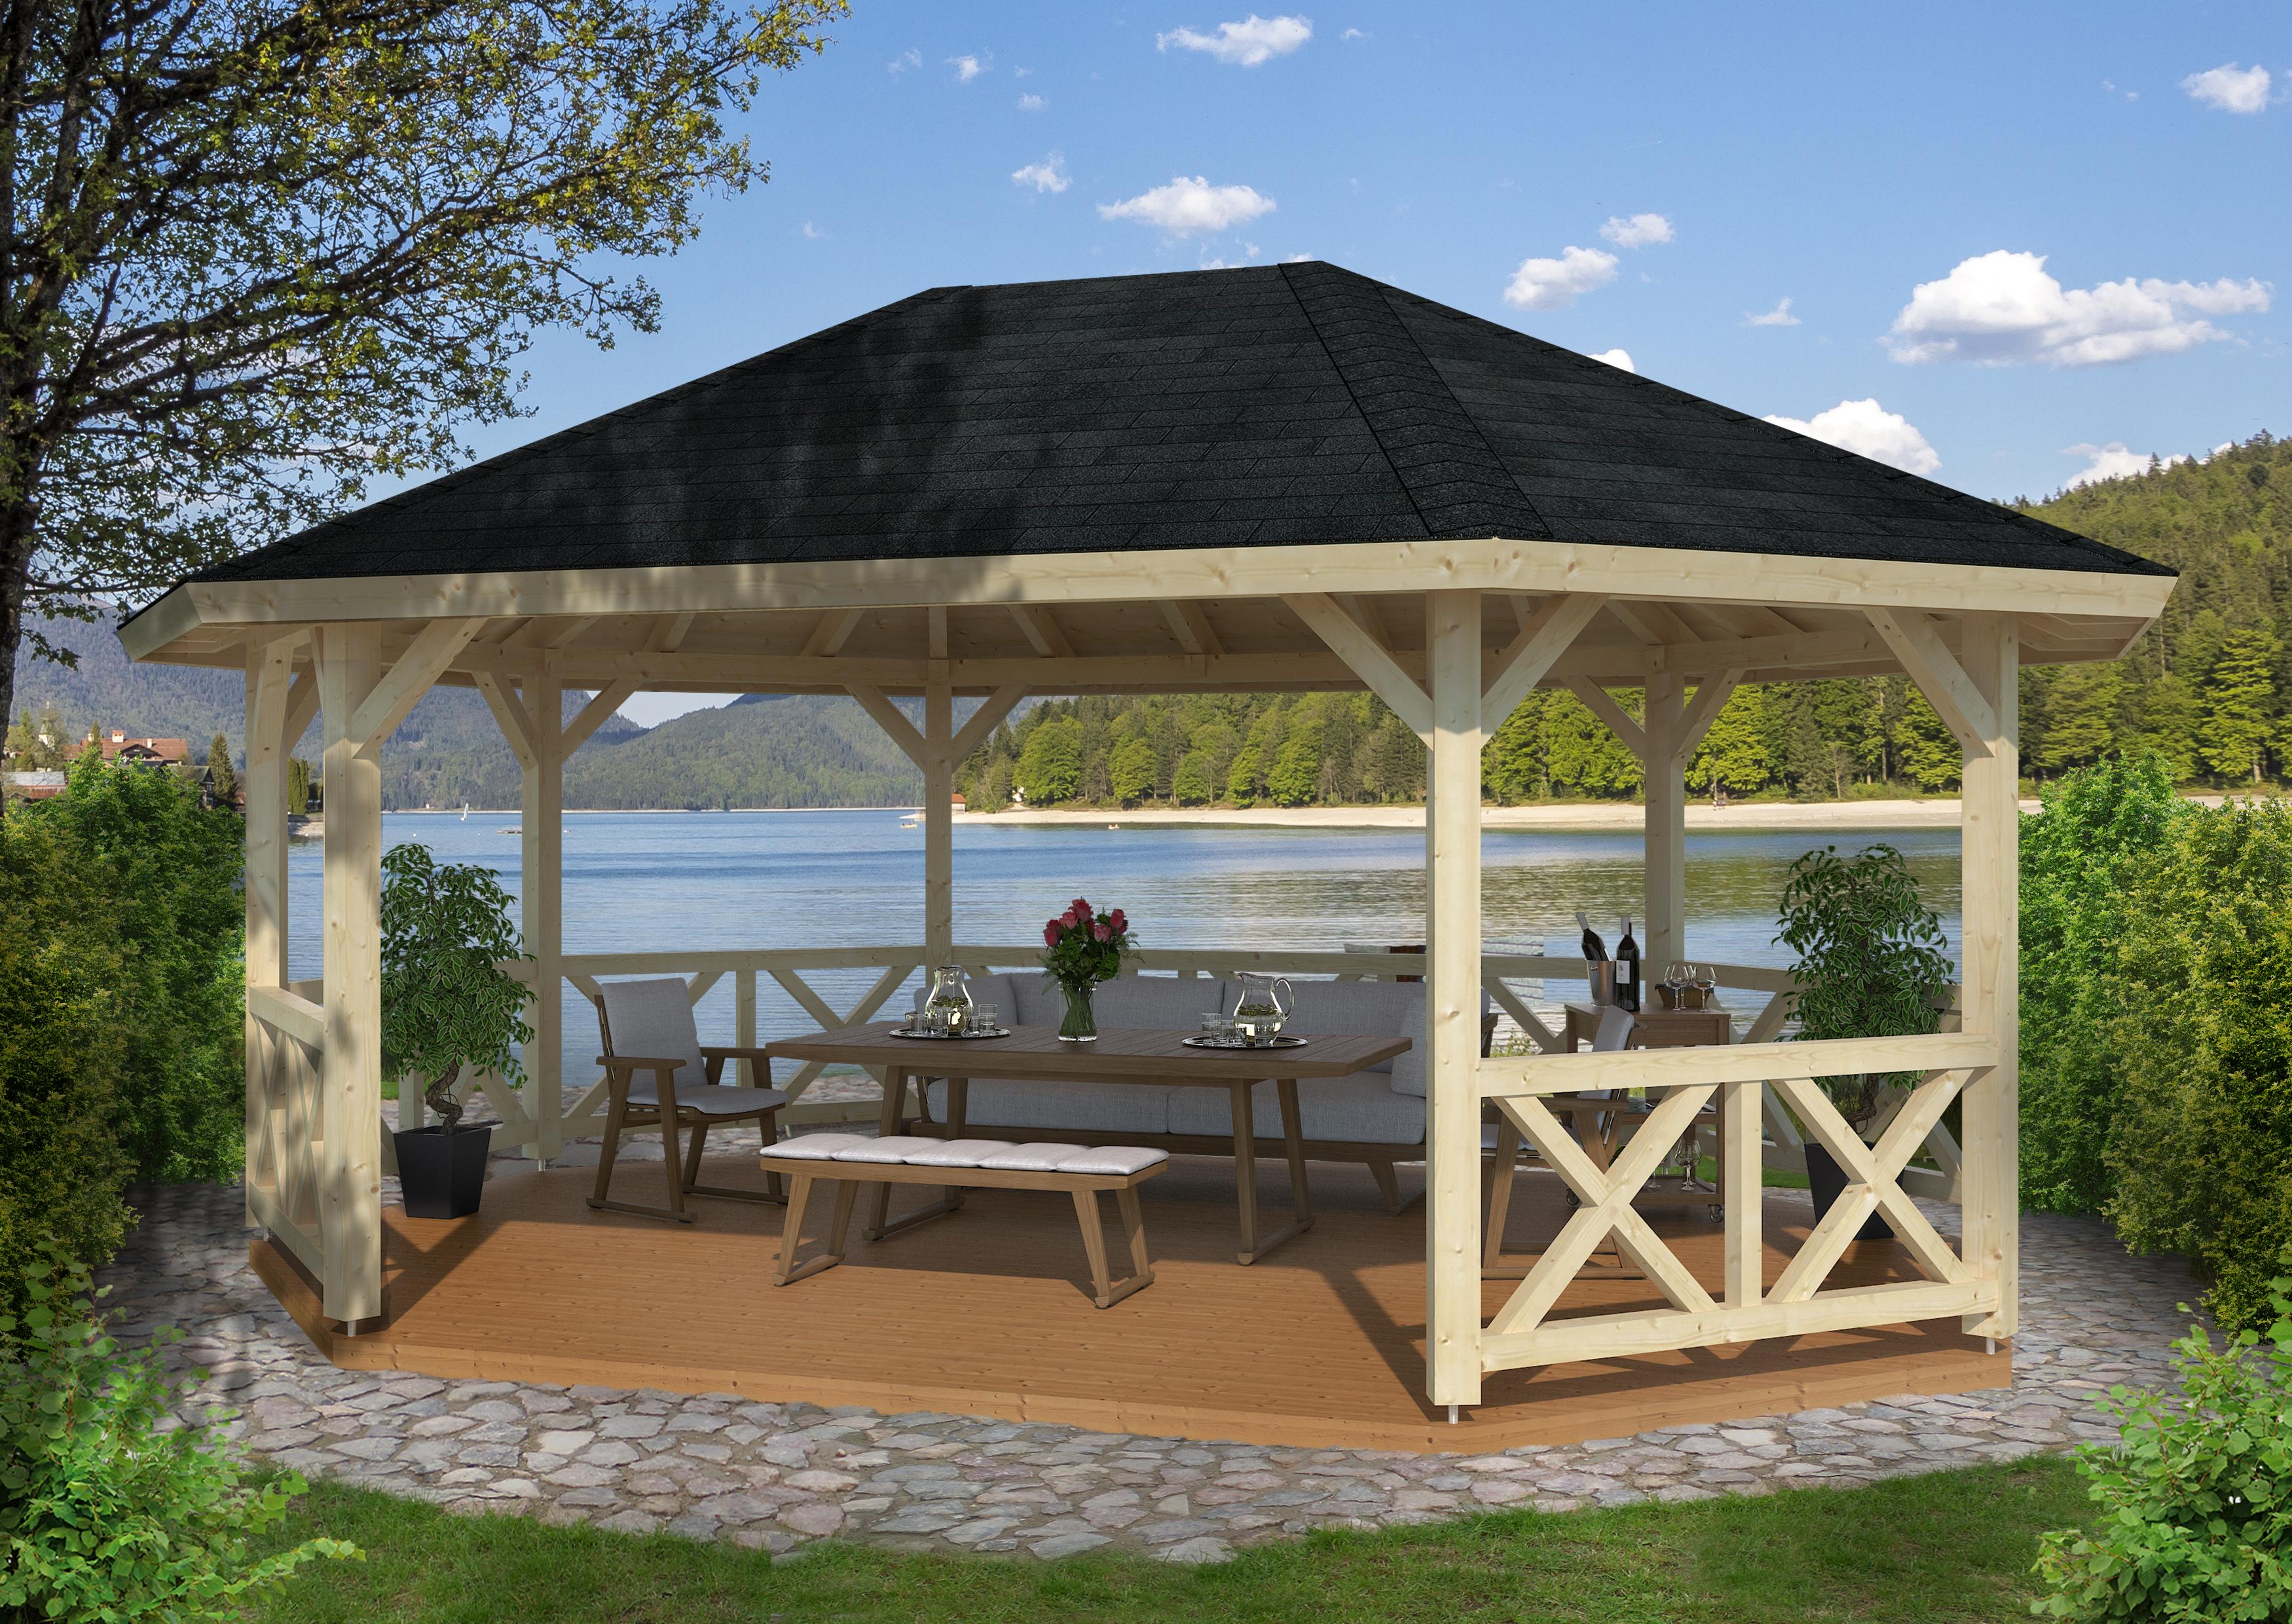 gartenpavillon betty 5 120x120 mm ca 615 cm holzwurm obersayn. Black Bedroom Furniture Sets. Home Design Ideas